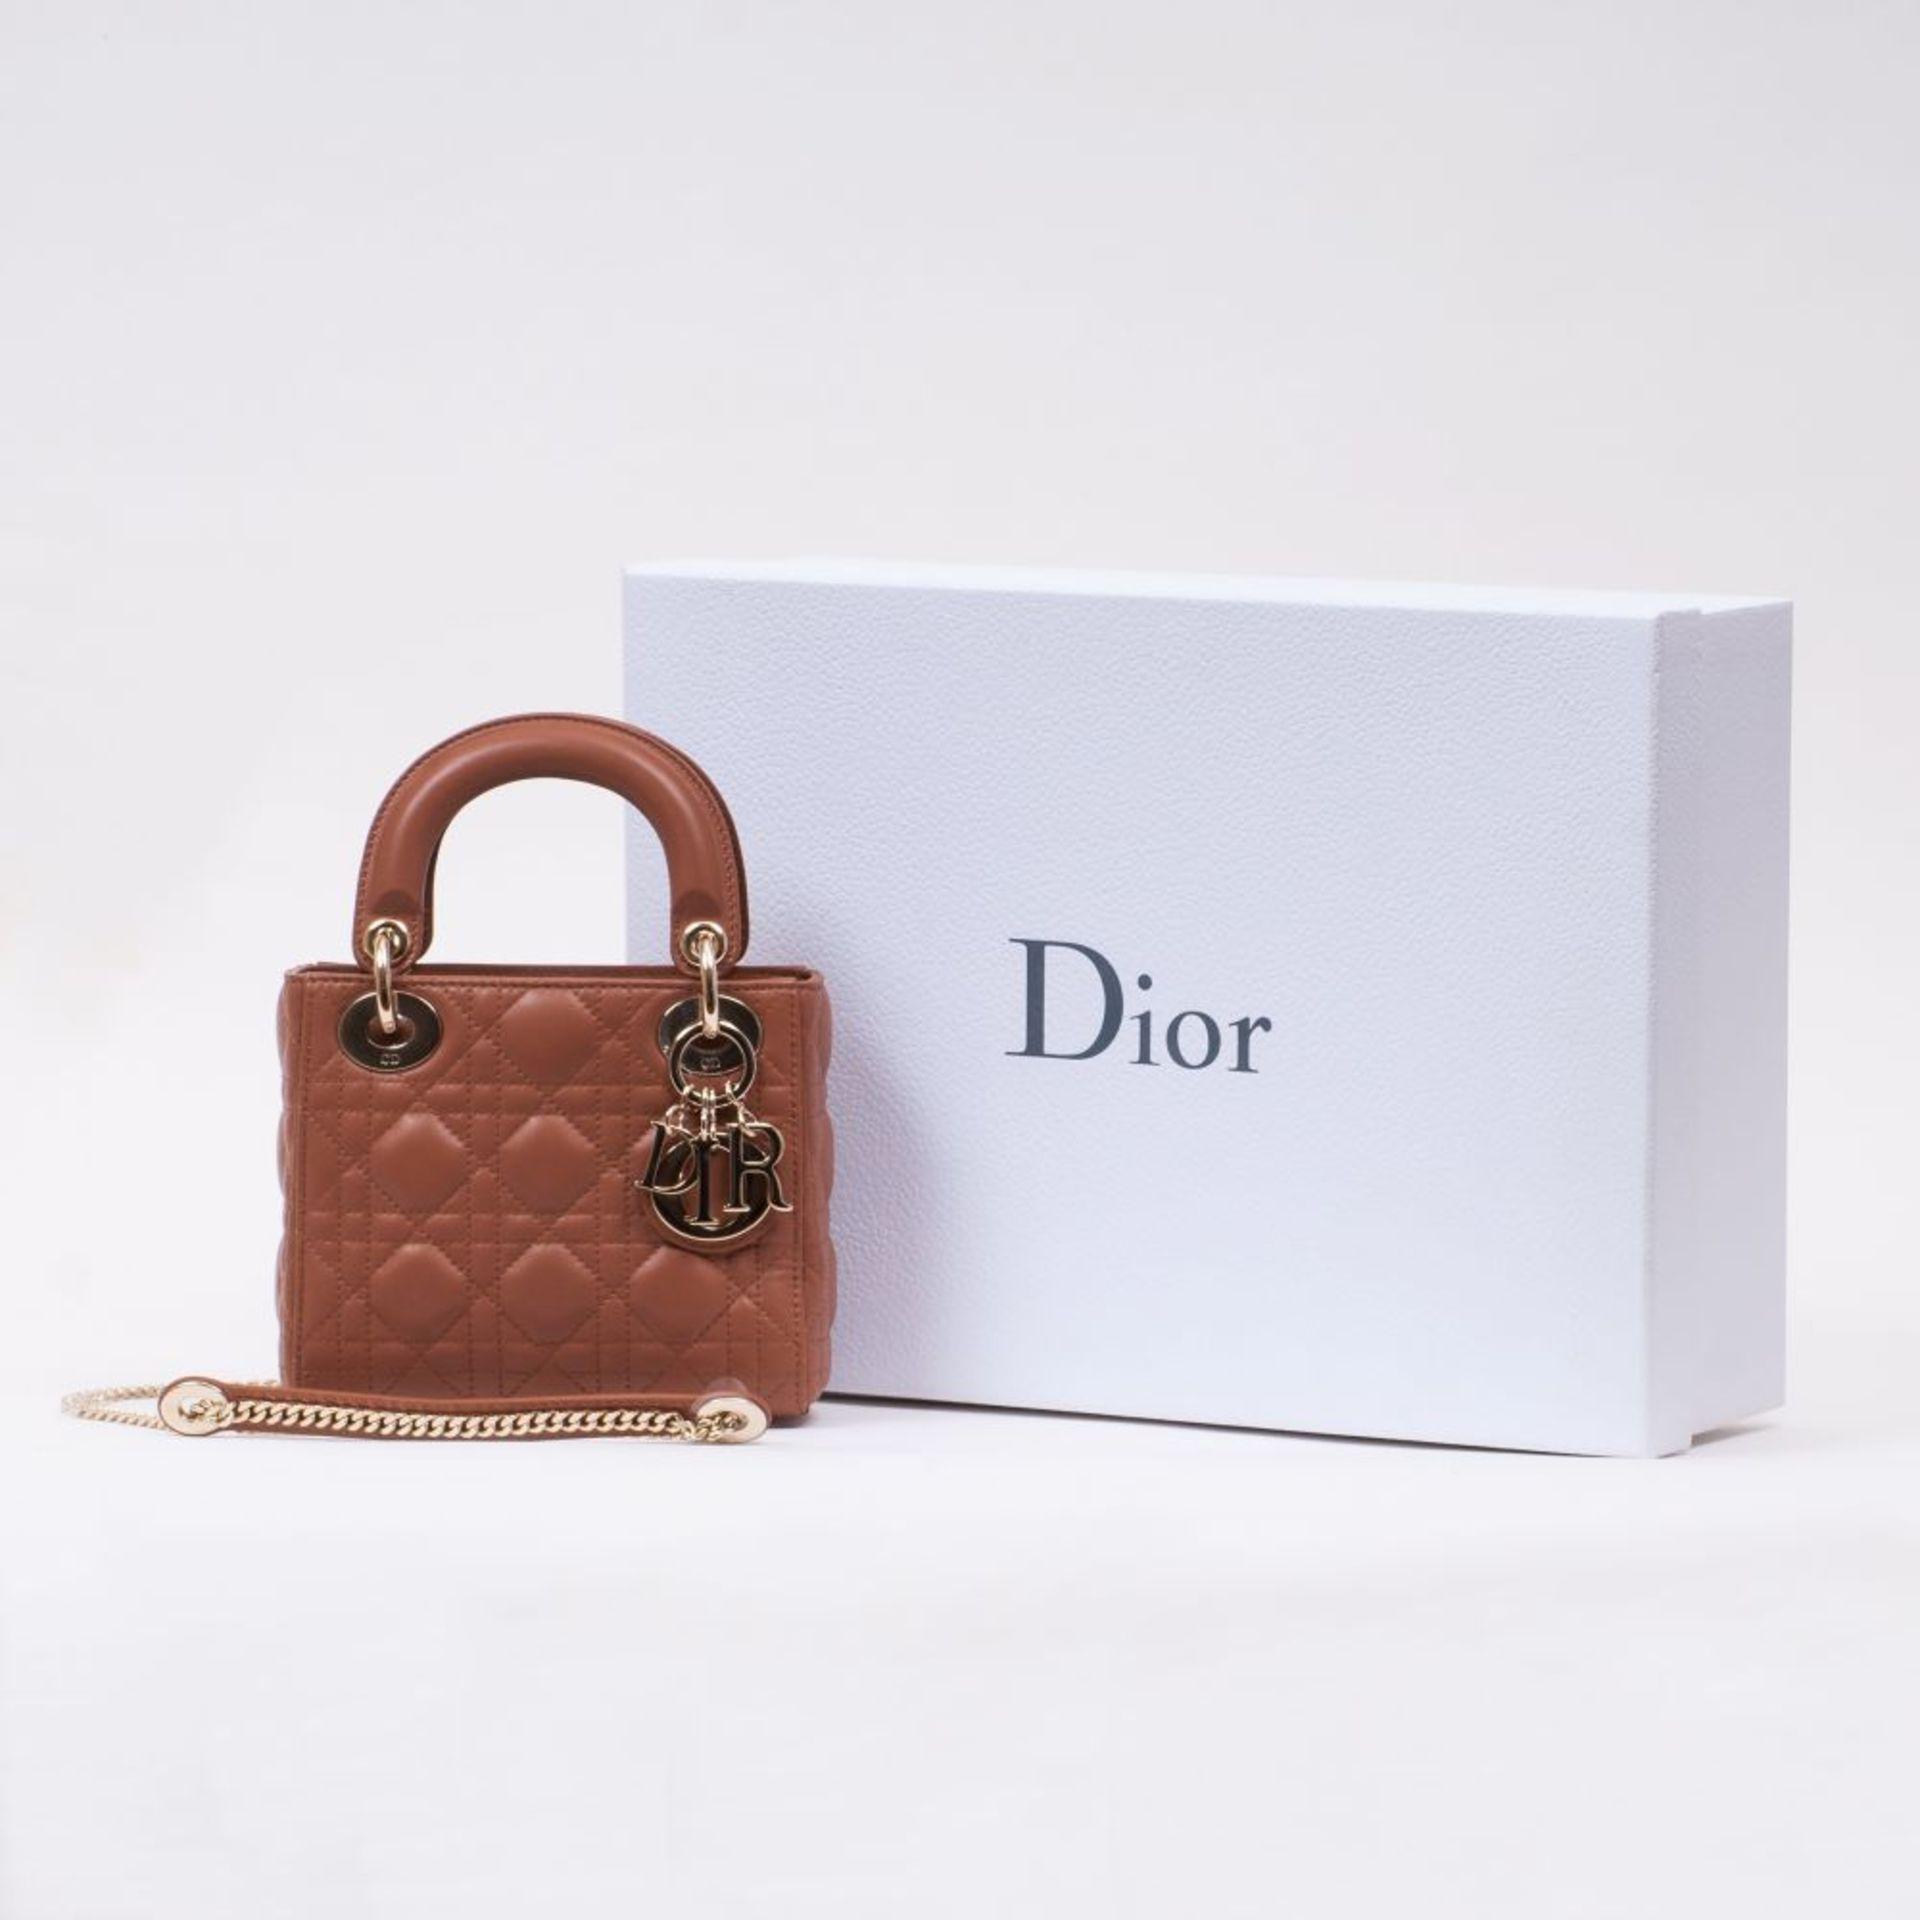 Christian Dior. Lady Dior Bag Braun. - Image 2 of 2